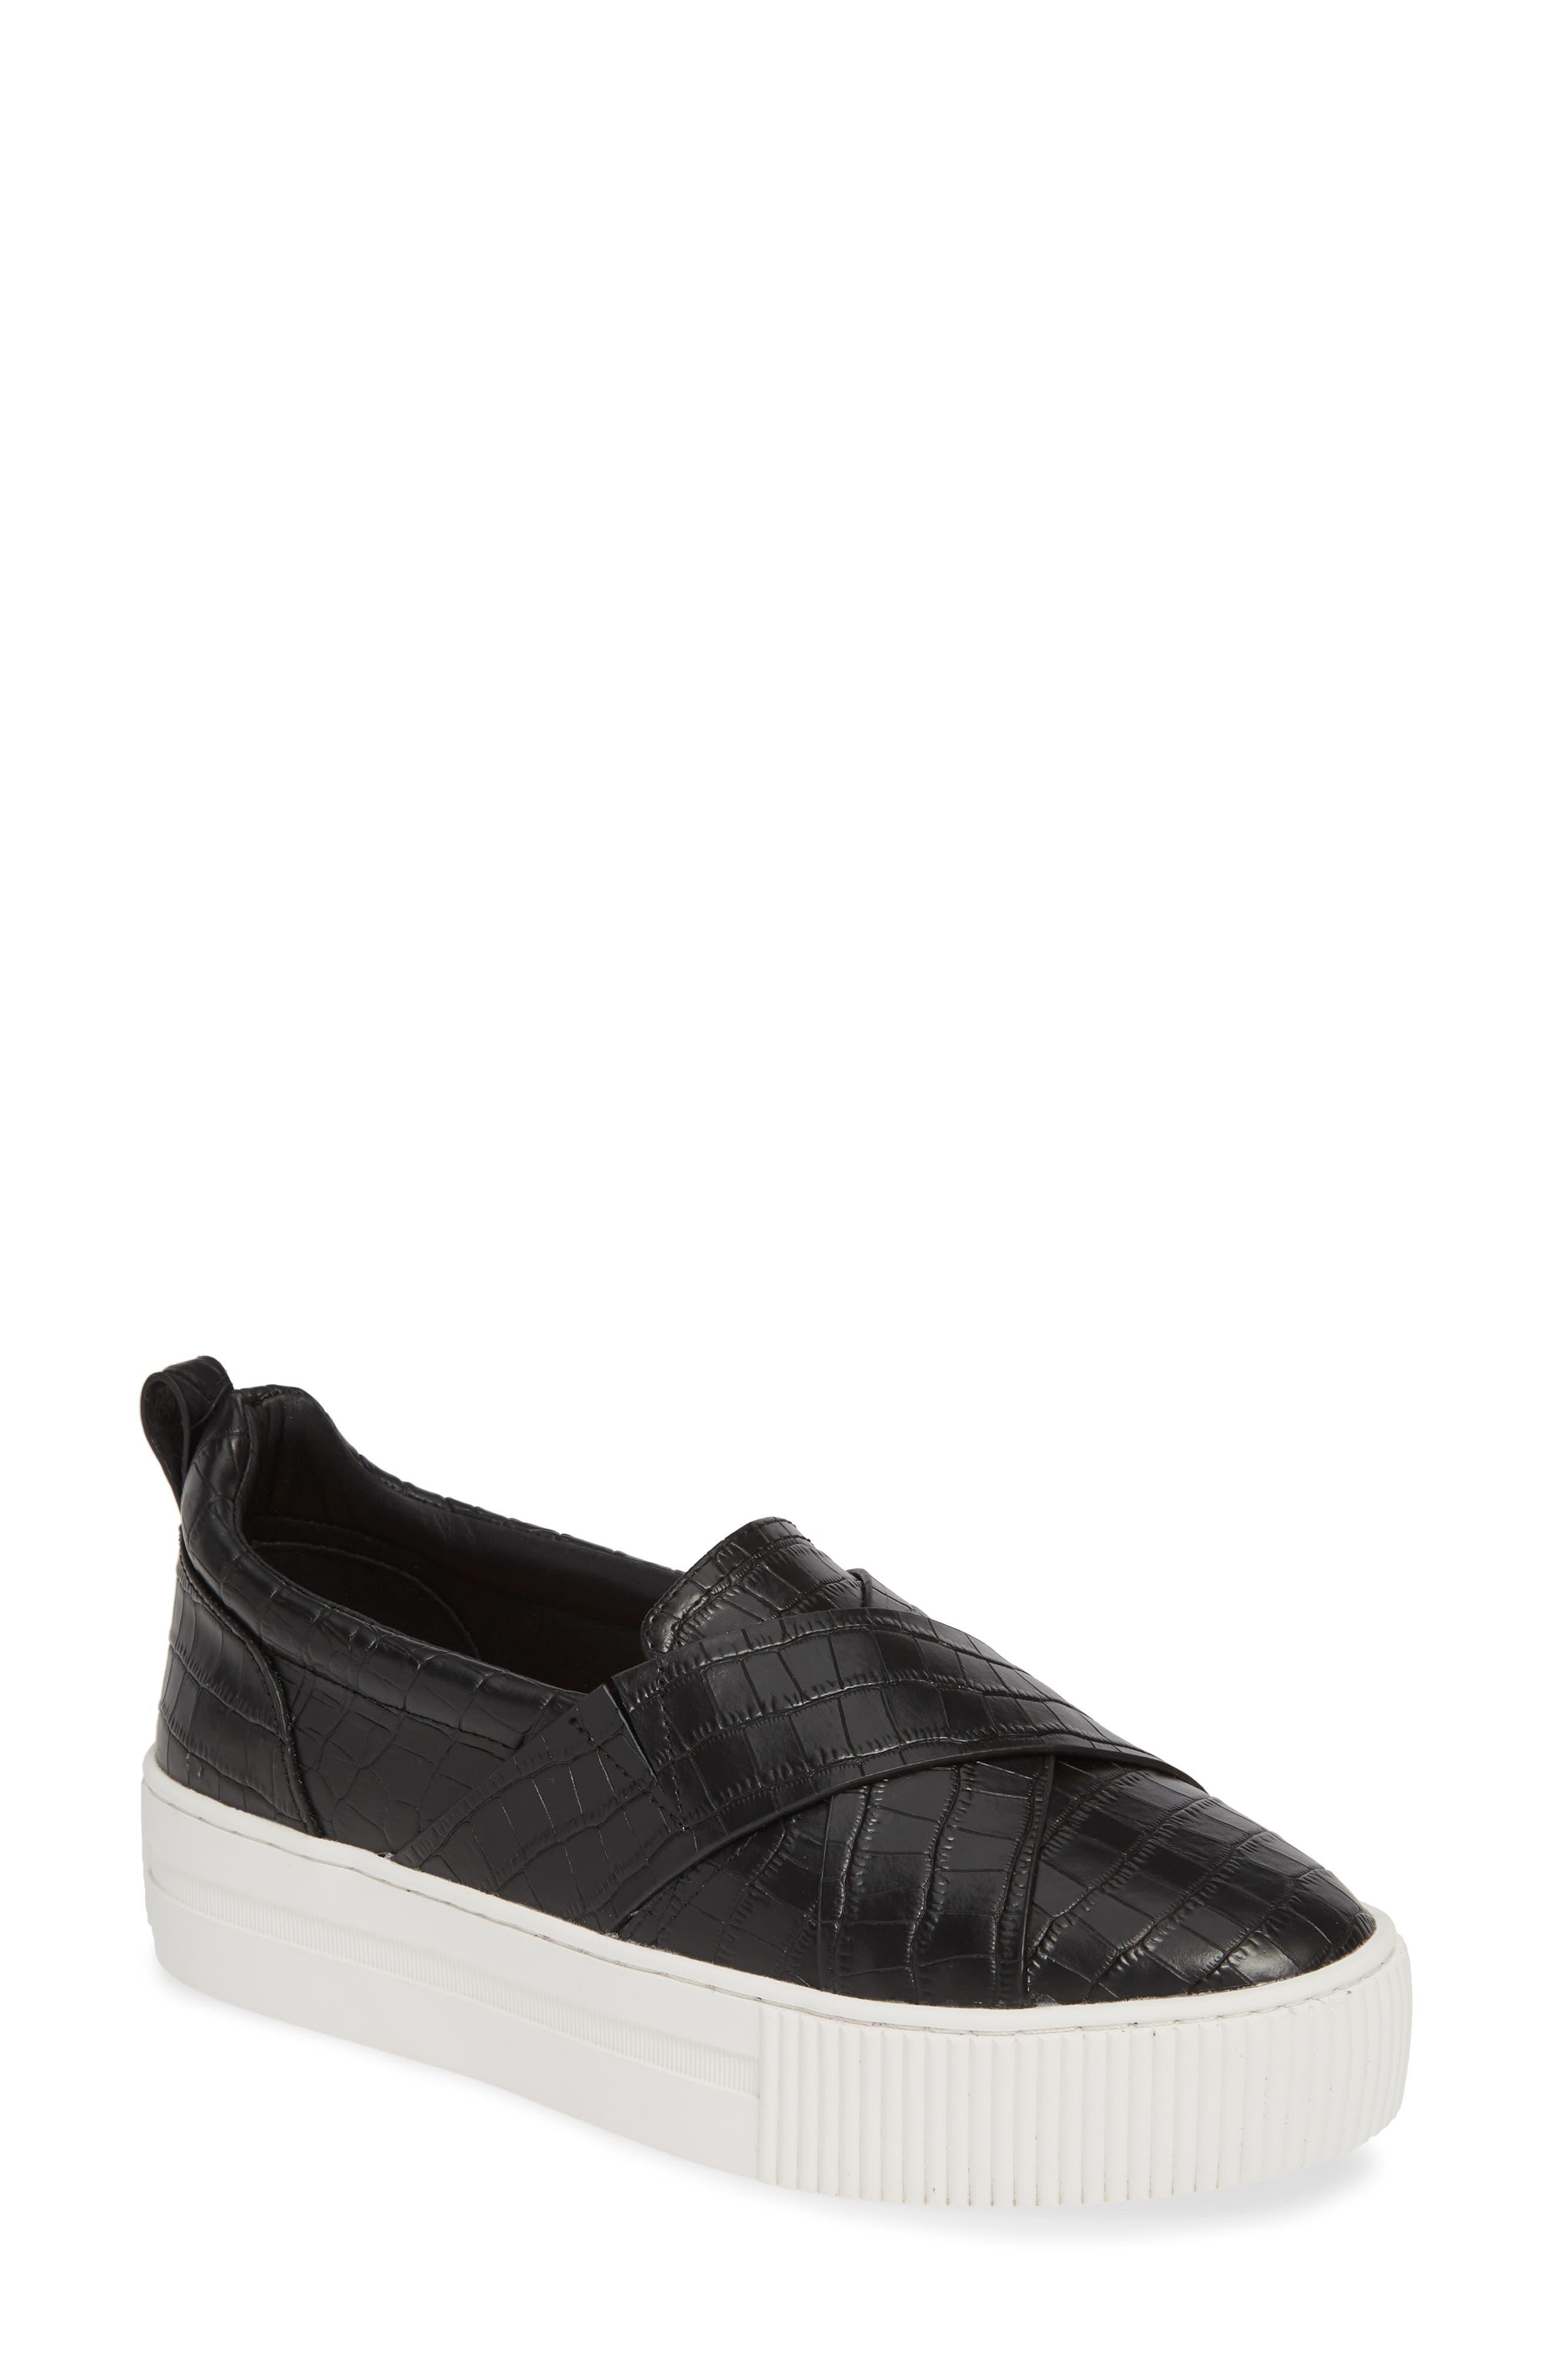 HALOGEN<SUP>®</SUP>, Blakely Slip-On Platform Sneaker, Main thumbnail 1, color, BLACK CROCO PRINTED LEATHER